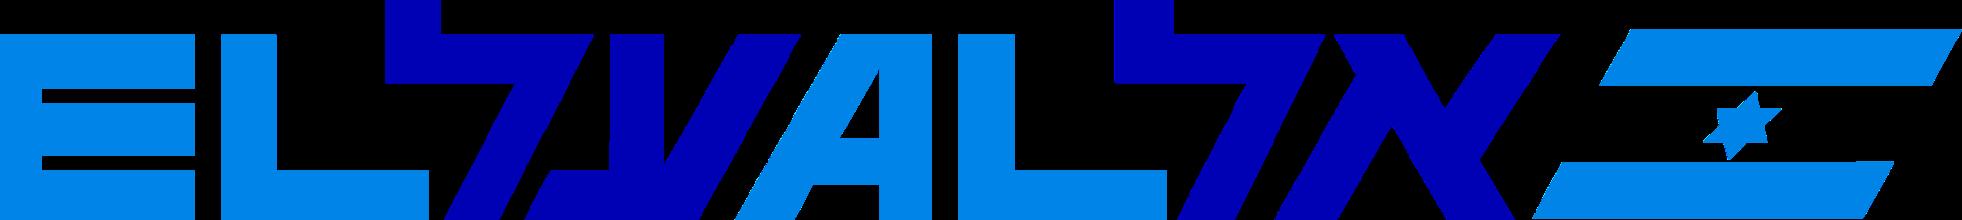 EL_AL_logo_old-1.png